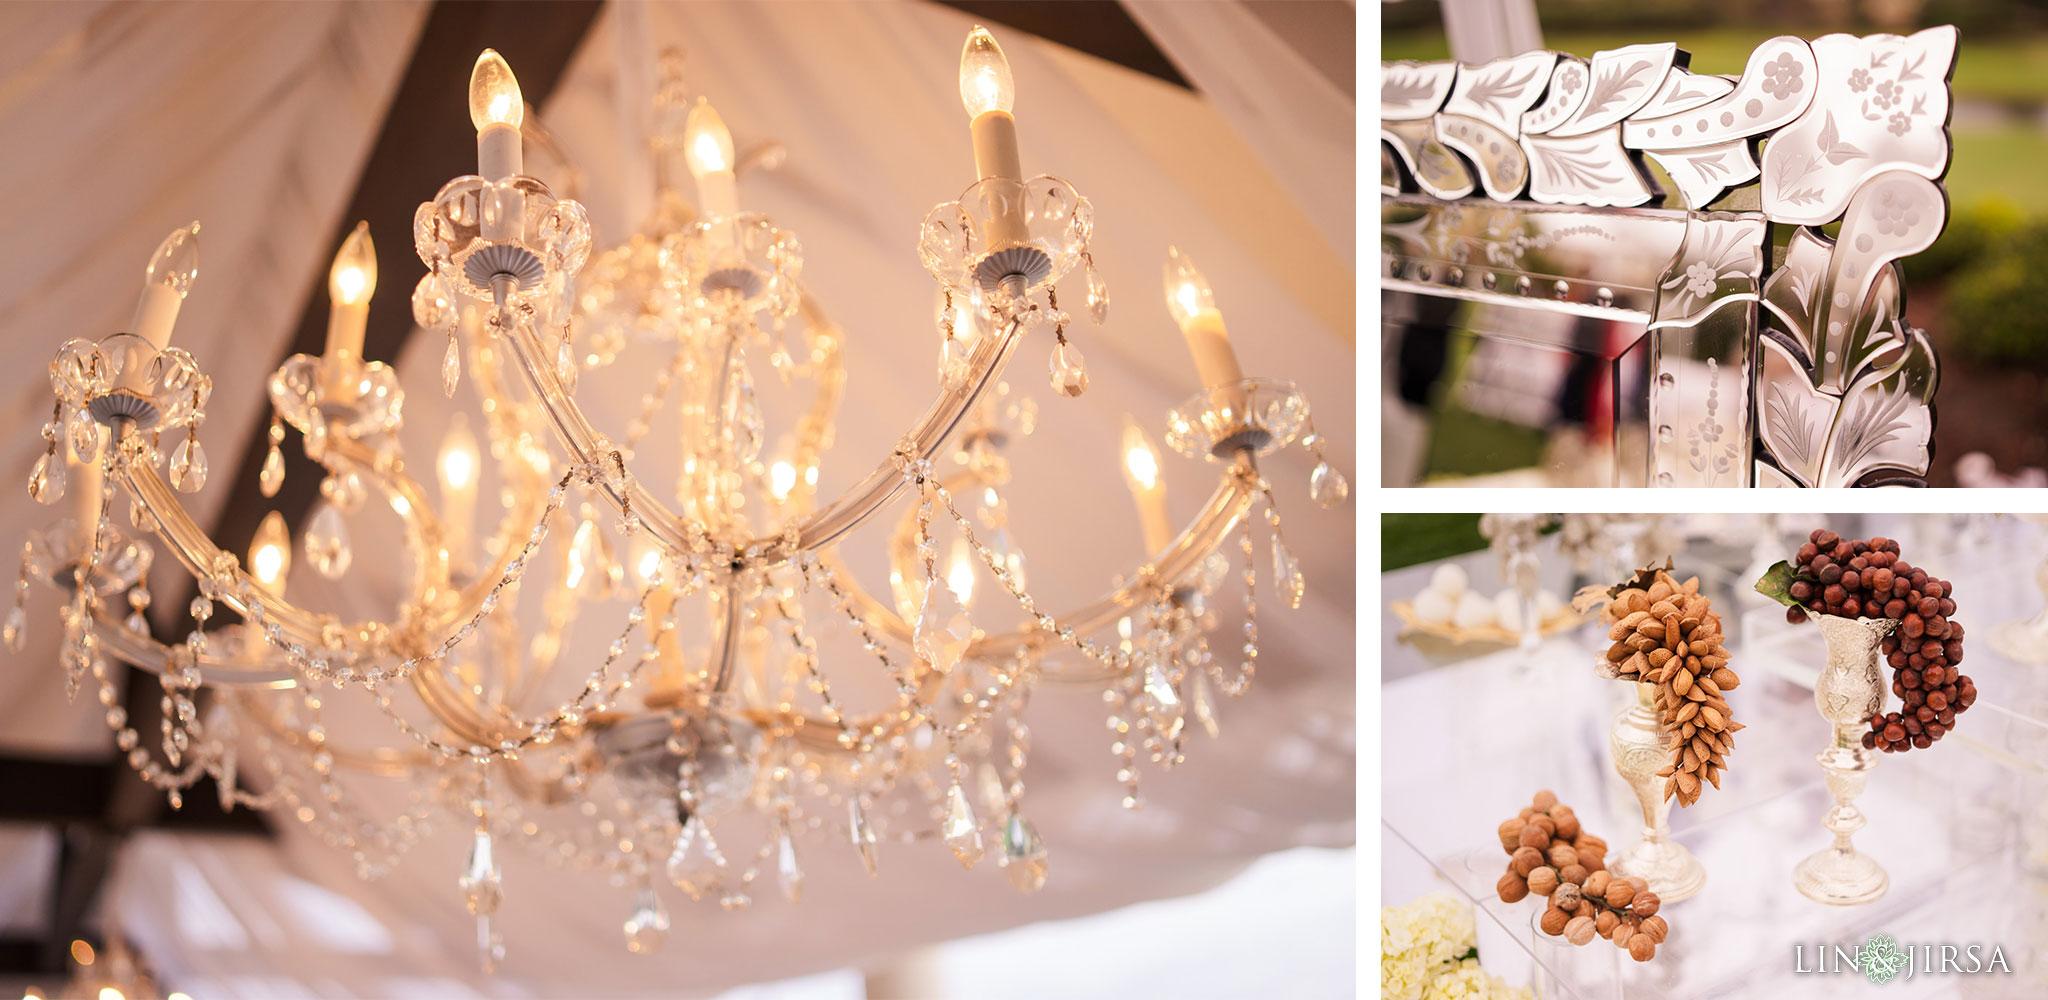 14 monarch beach resort laguna niguel persian wedding photography